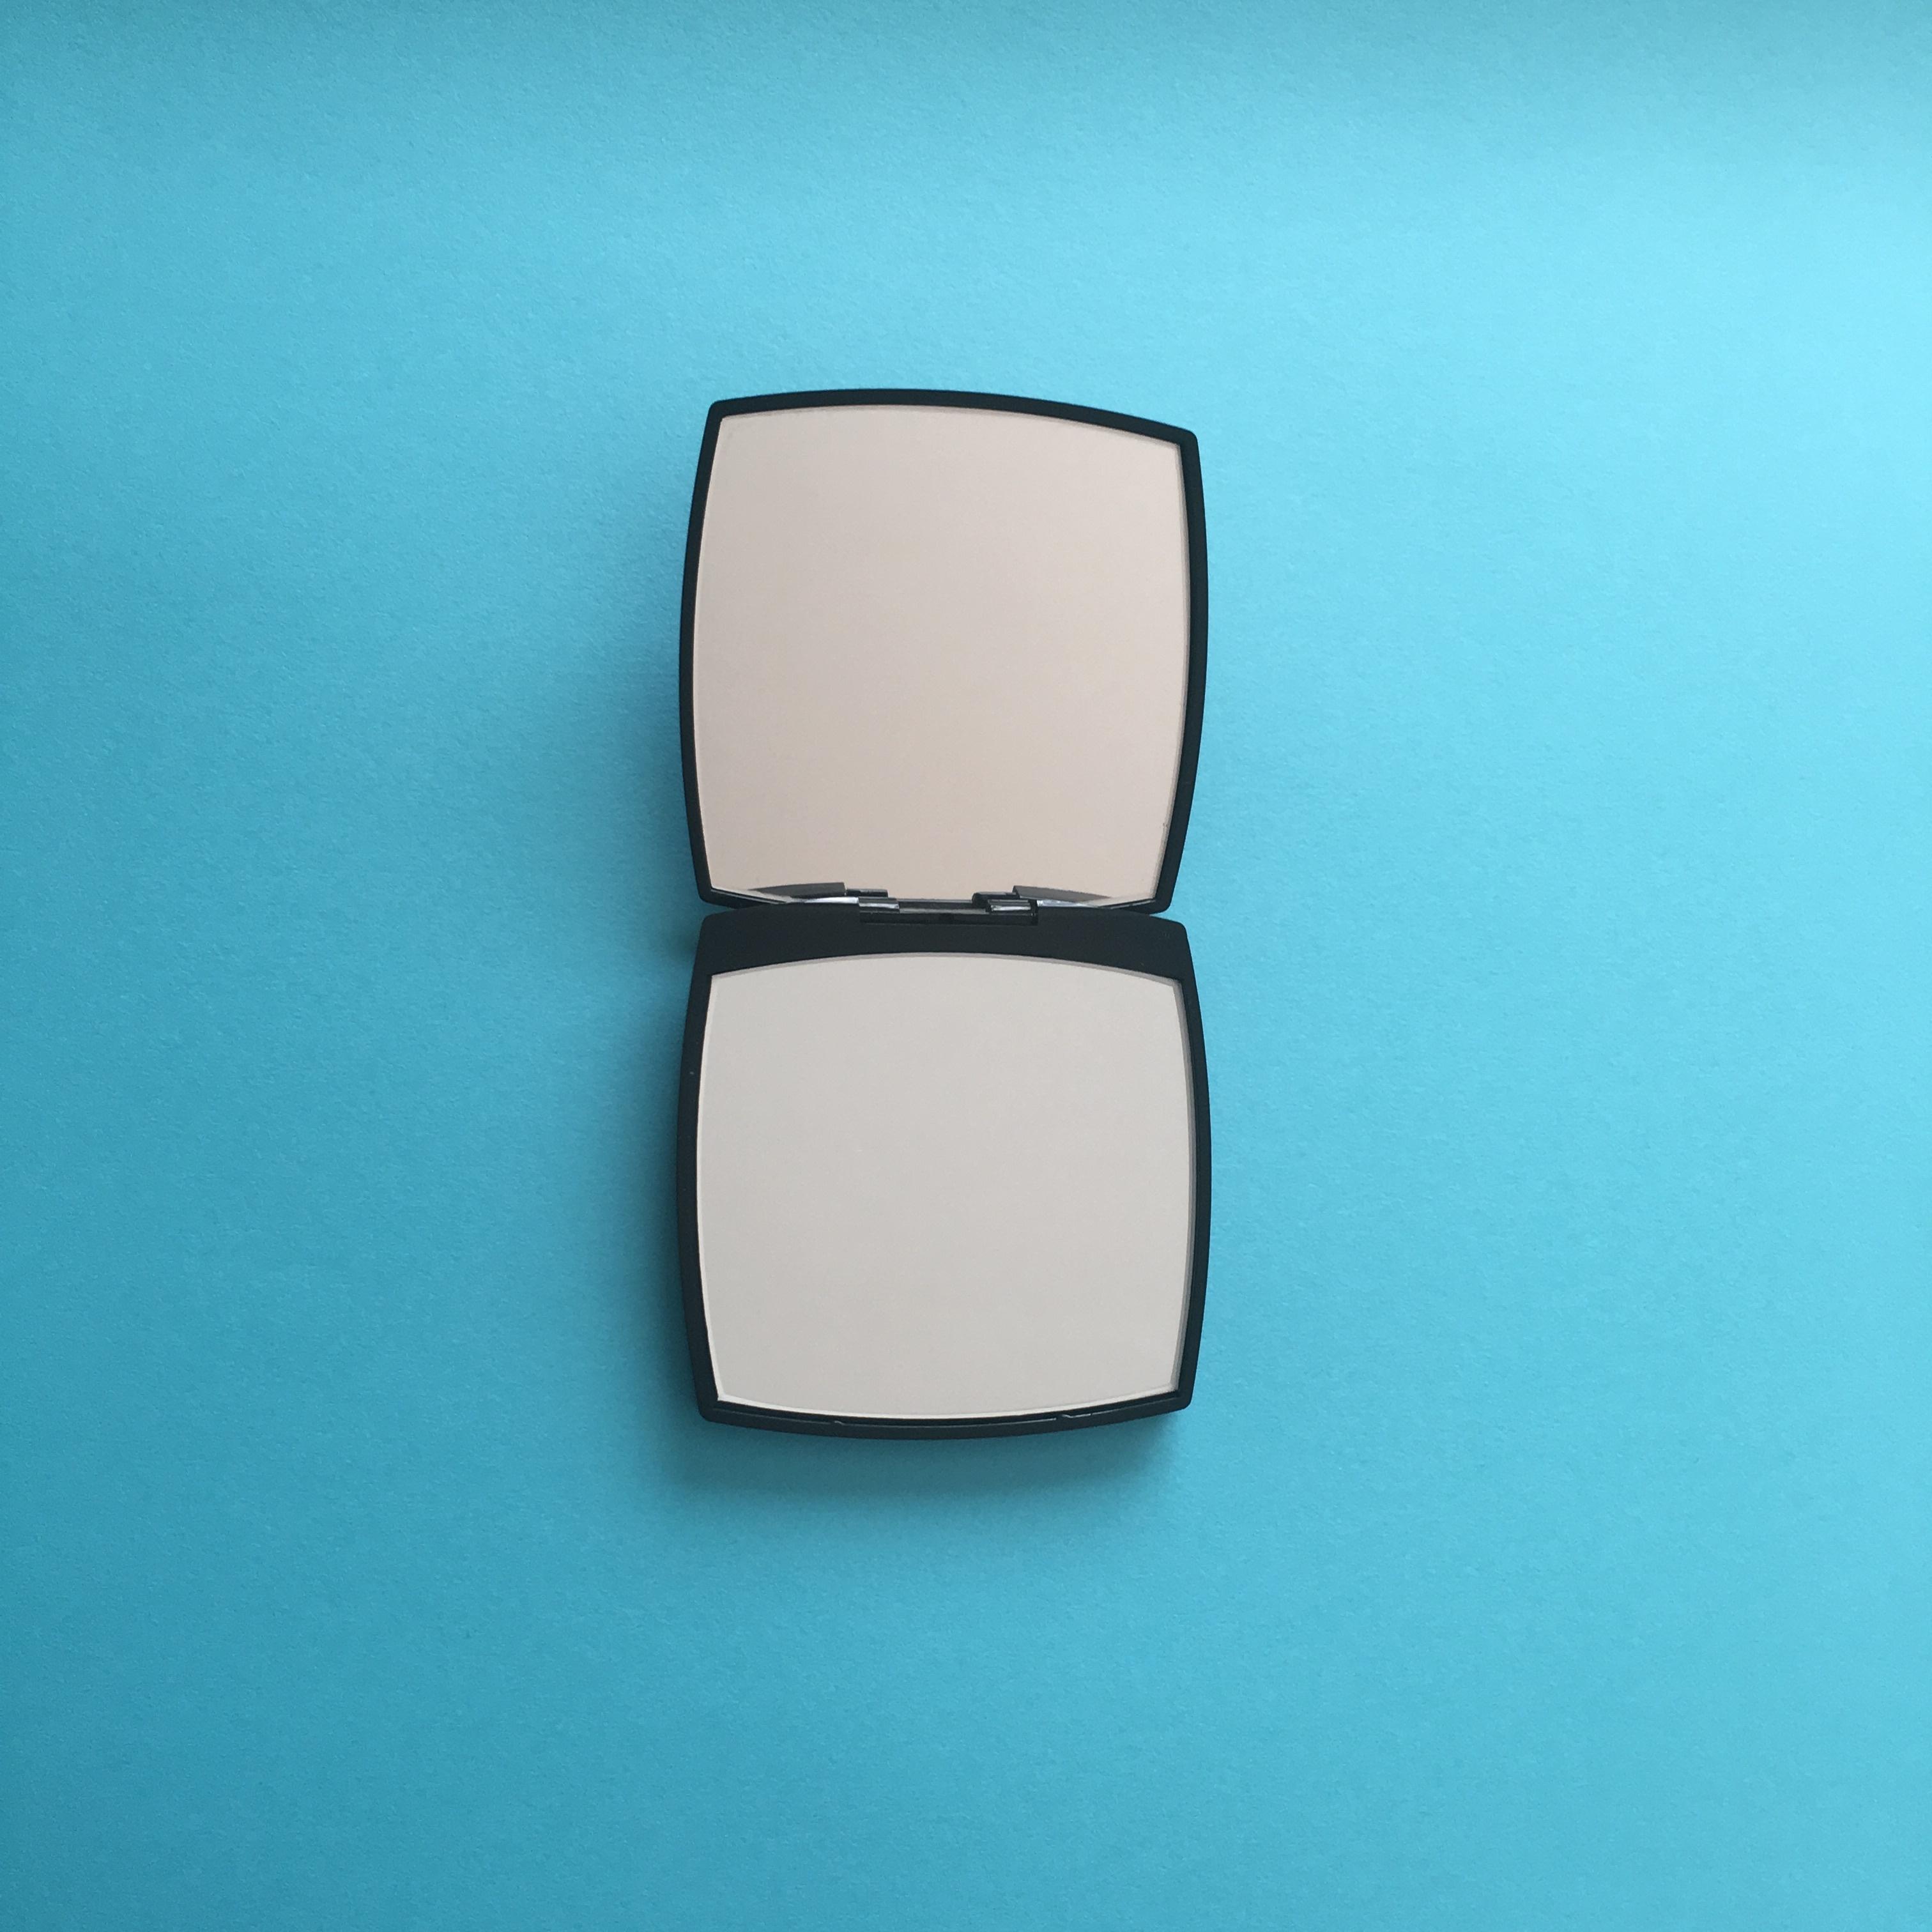 a8e752f15da5 【シャネル ミロワール ドゥーブル ファセット ¥4700】シャネルのコンパクトそのもののルックスが可愛いミラー。安定の黒いヴェルヴェットの袋付きで、鏡がうっかり  ...